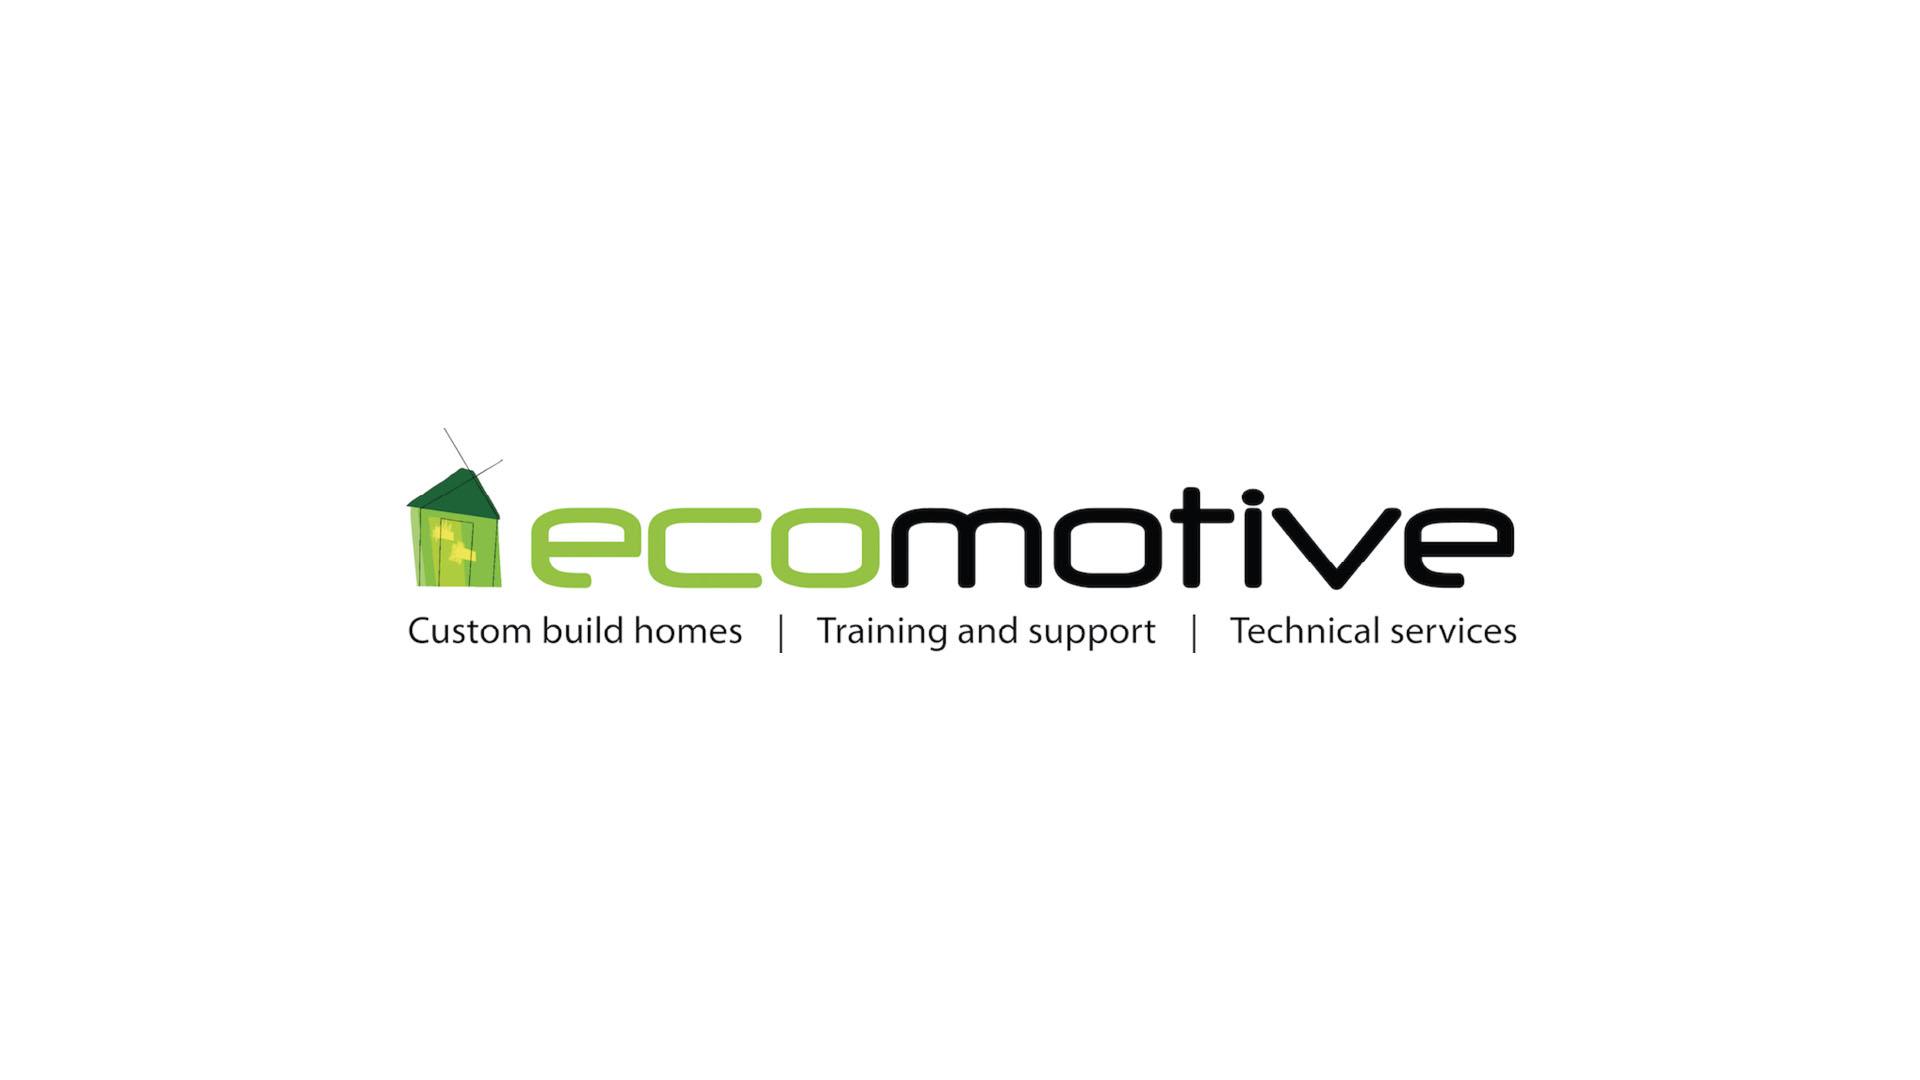 _0022_Ecomotive.jpg